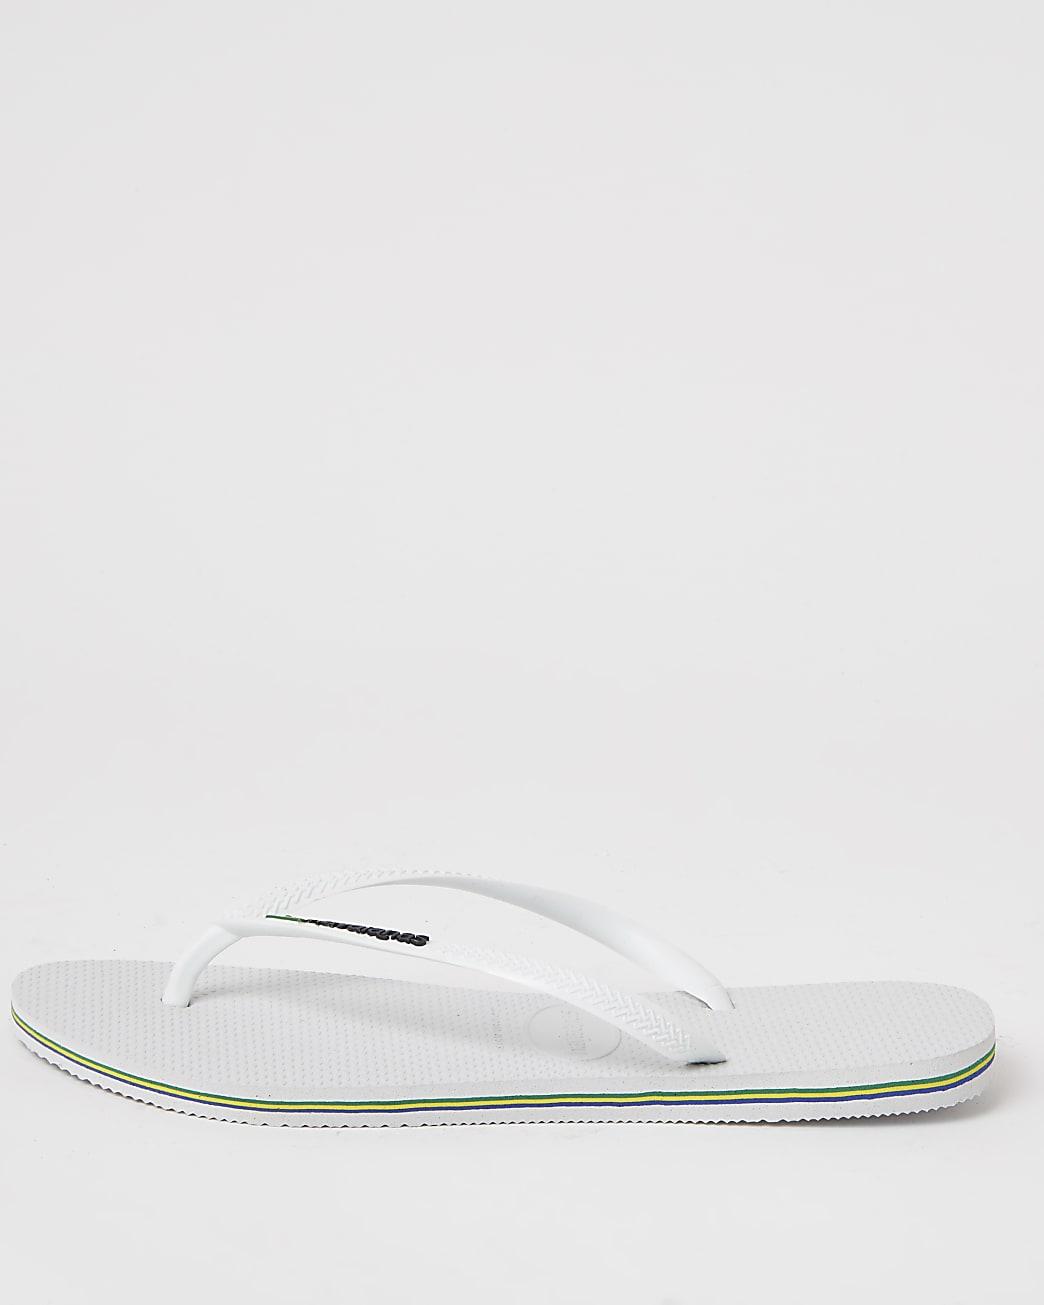 Haviana white flip flops